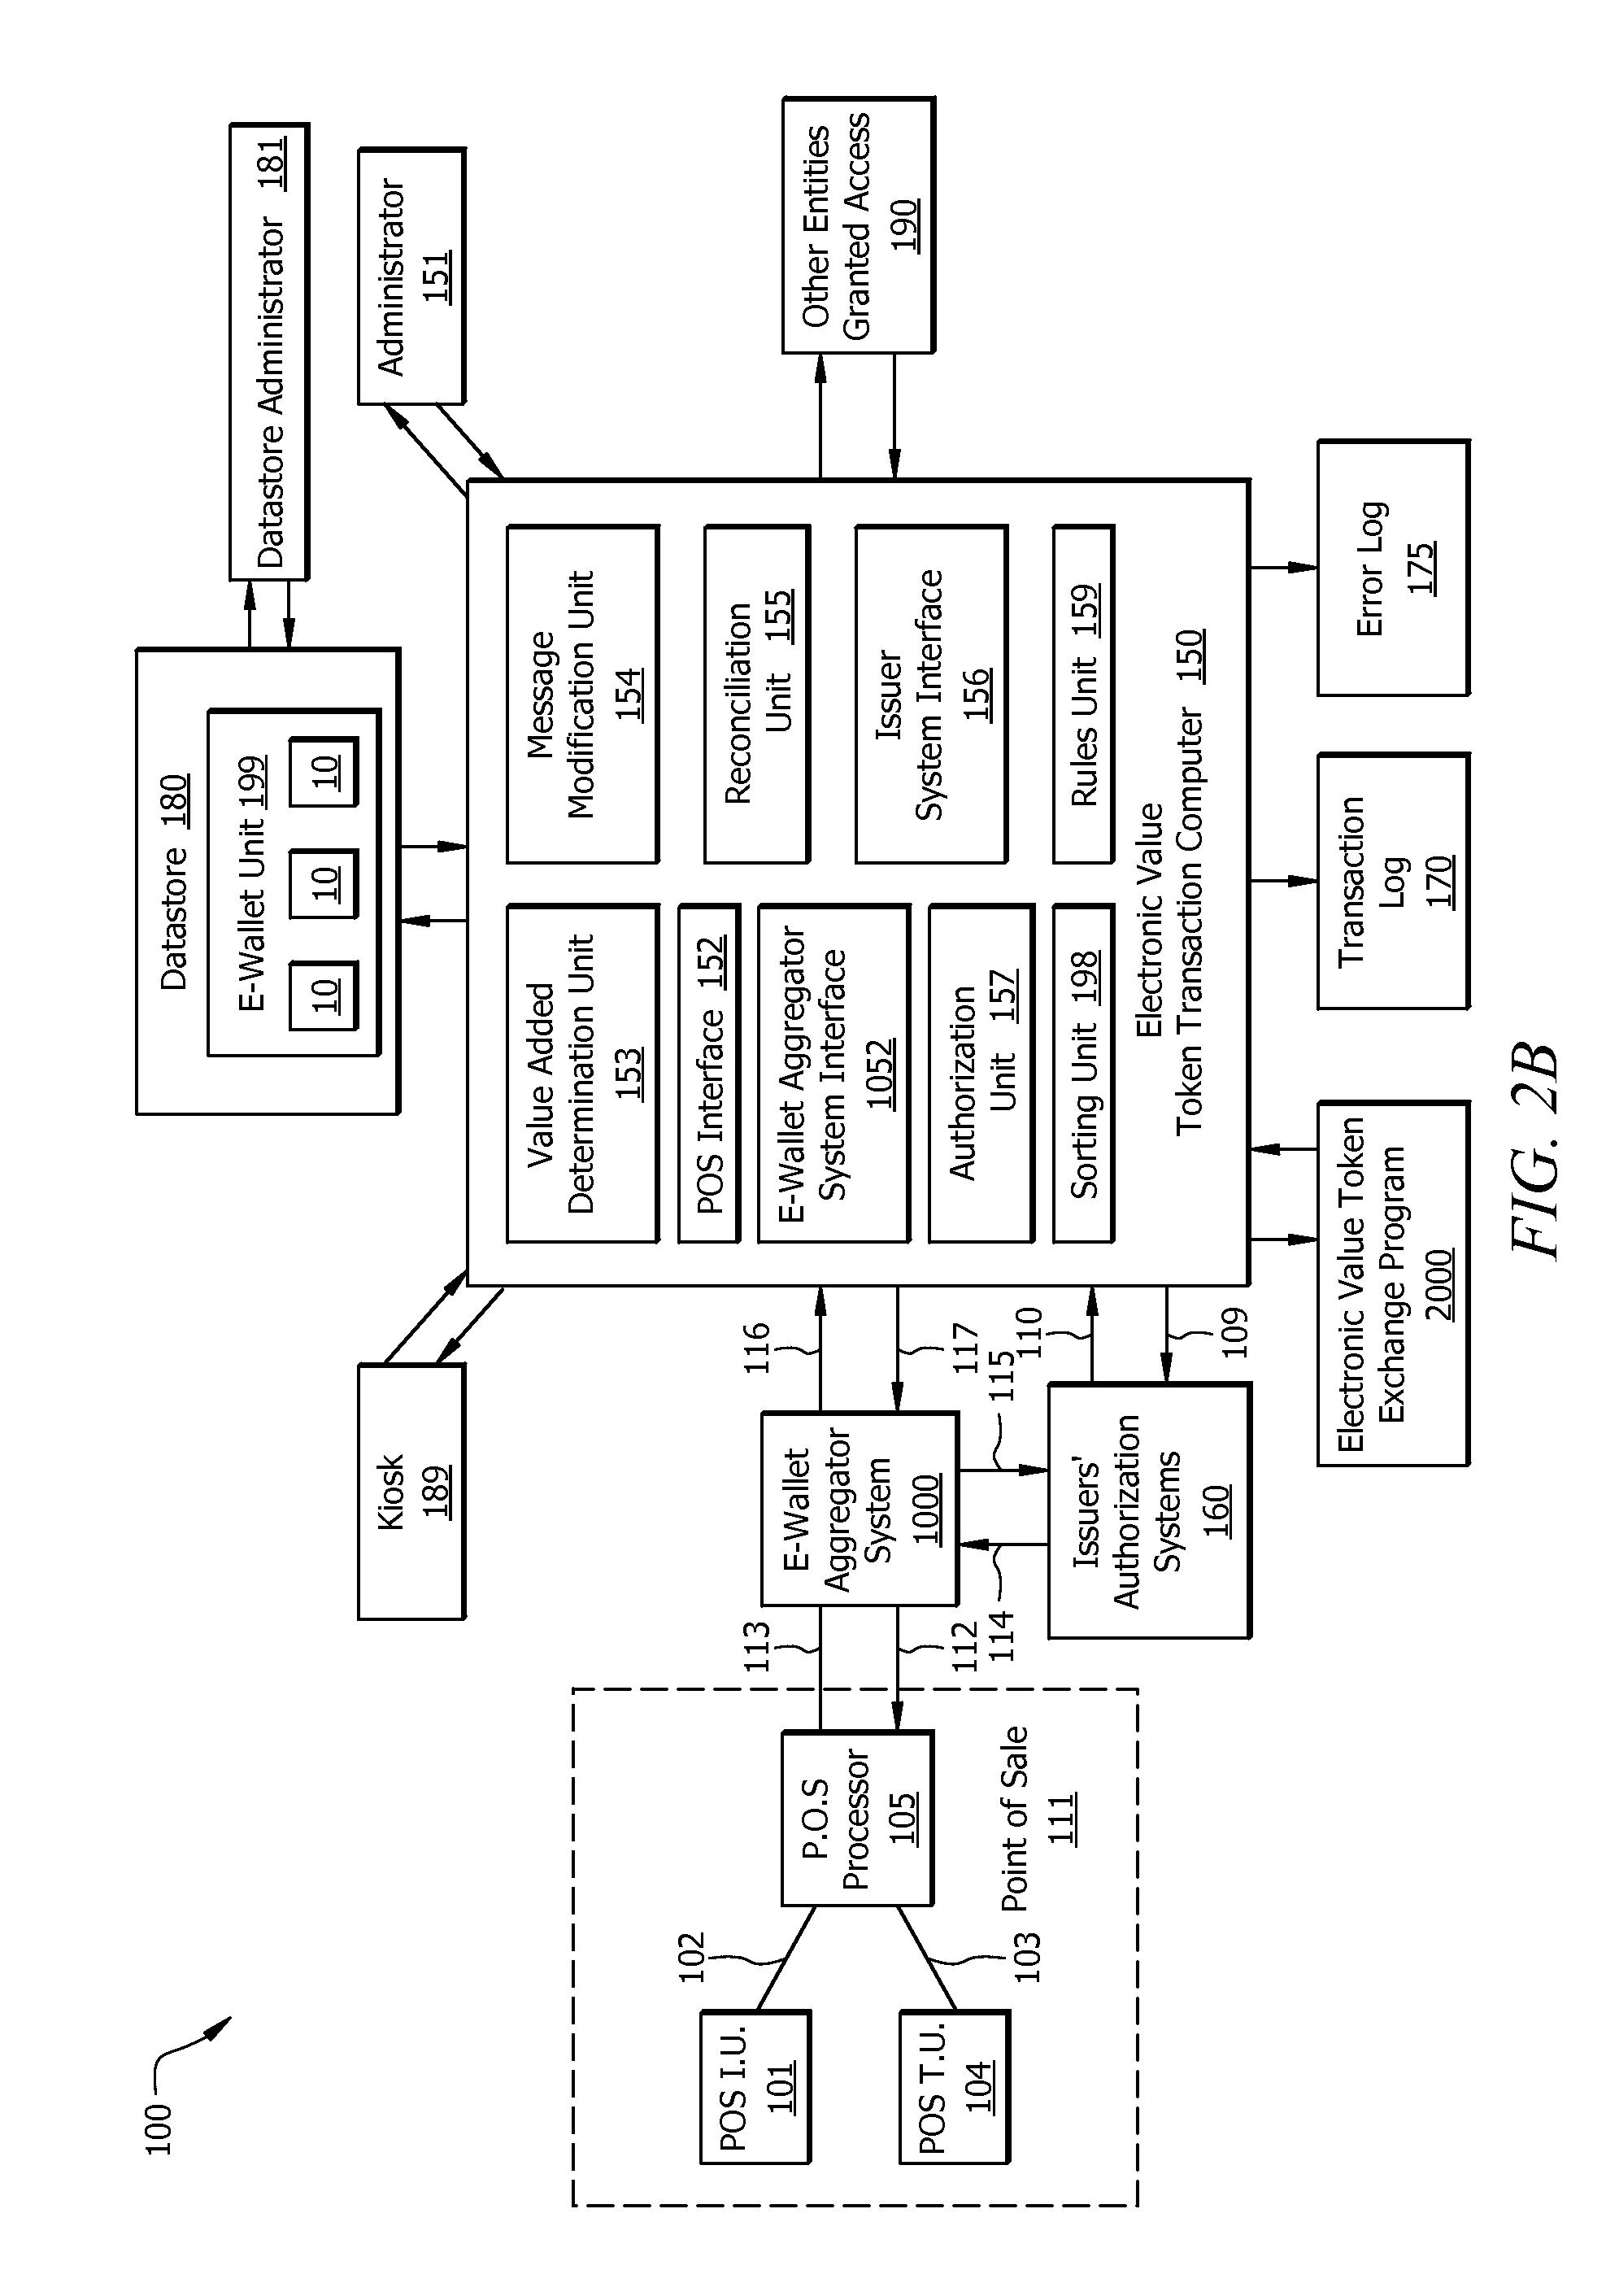 2005 Mercury Monterey Vacuum Diagram Trusted Wiring Vauxhall Diagrams Data Base 1957 Montclair